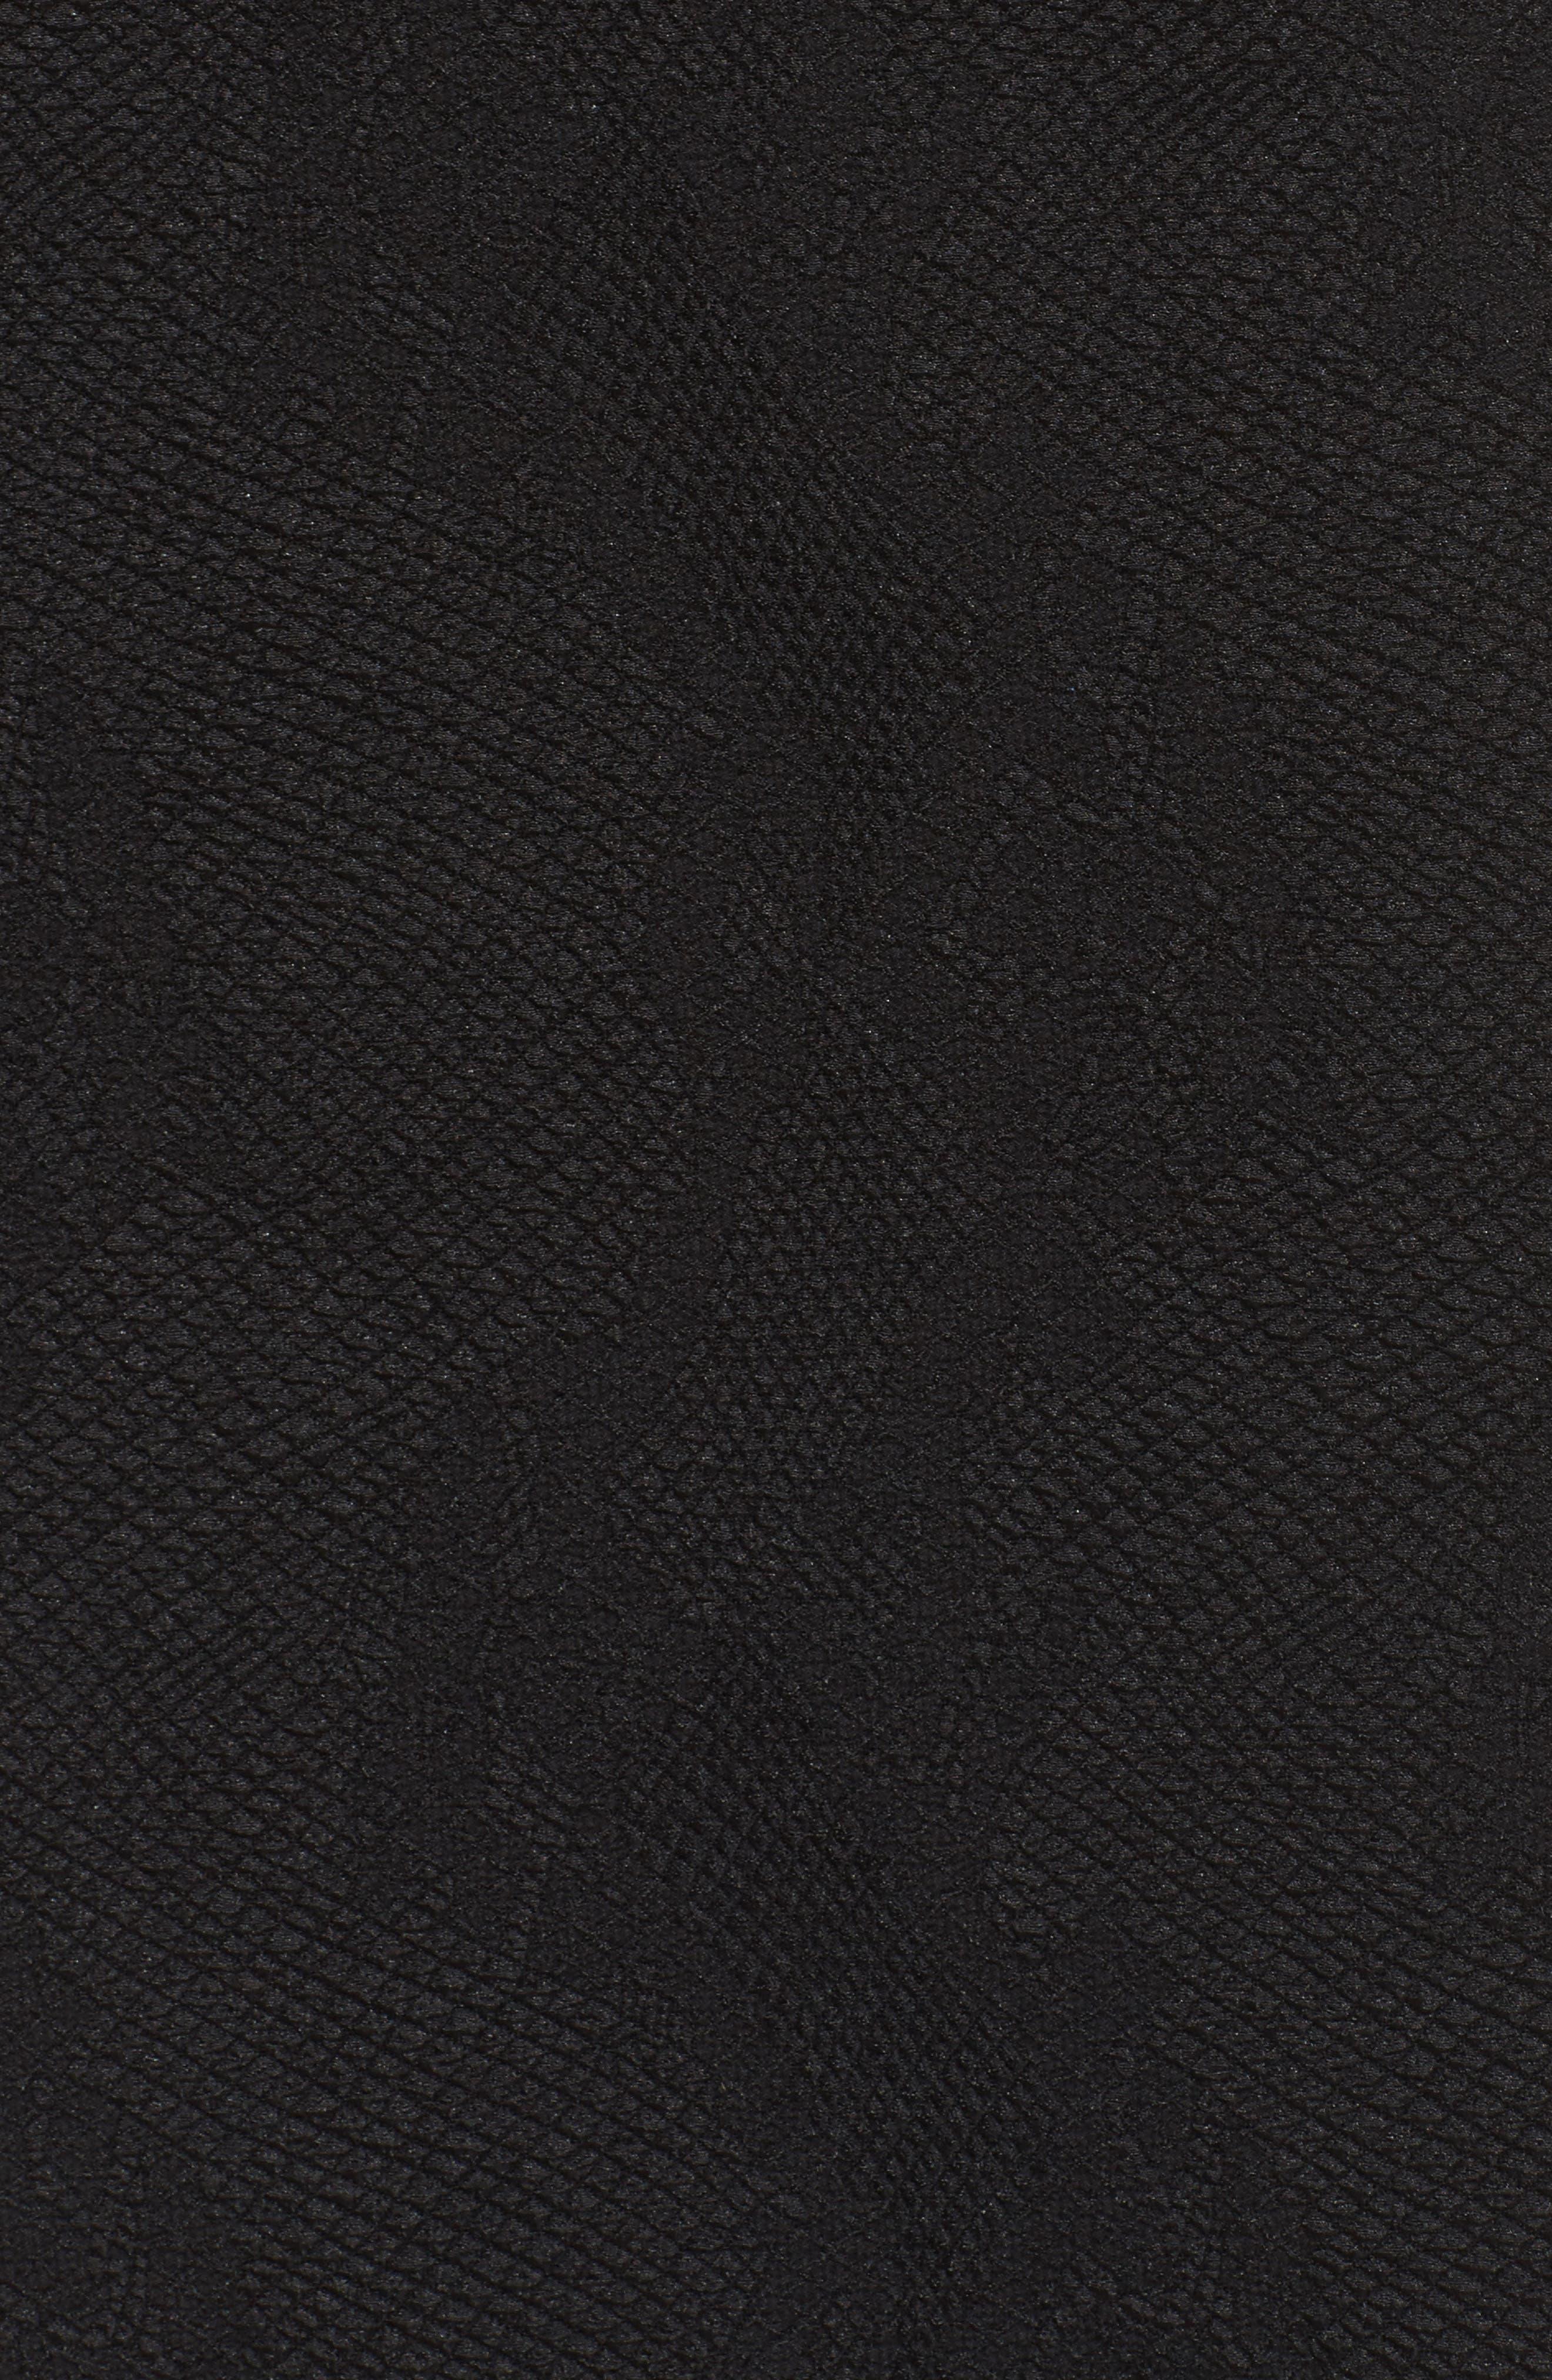 Alternate Image 5  - Tadashi Shoji Sequin Embroidered Textured Crepe Gown (Regular & Petite)